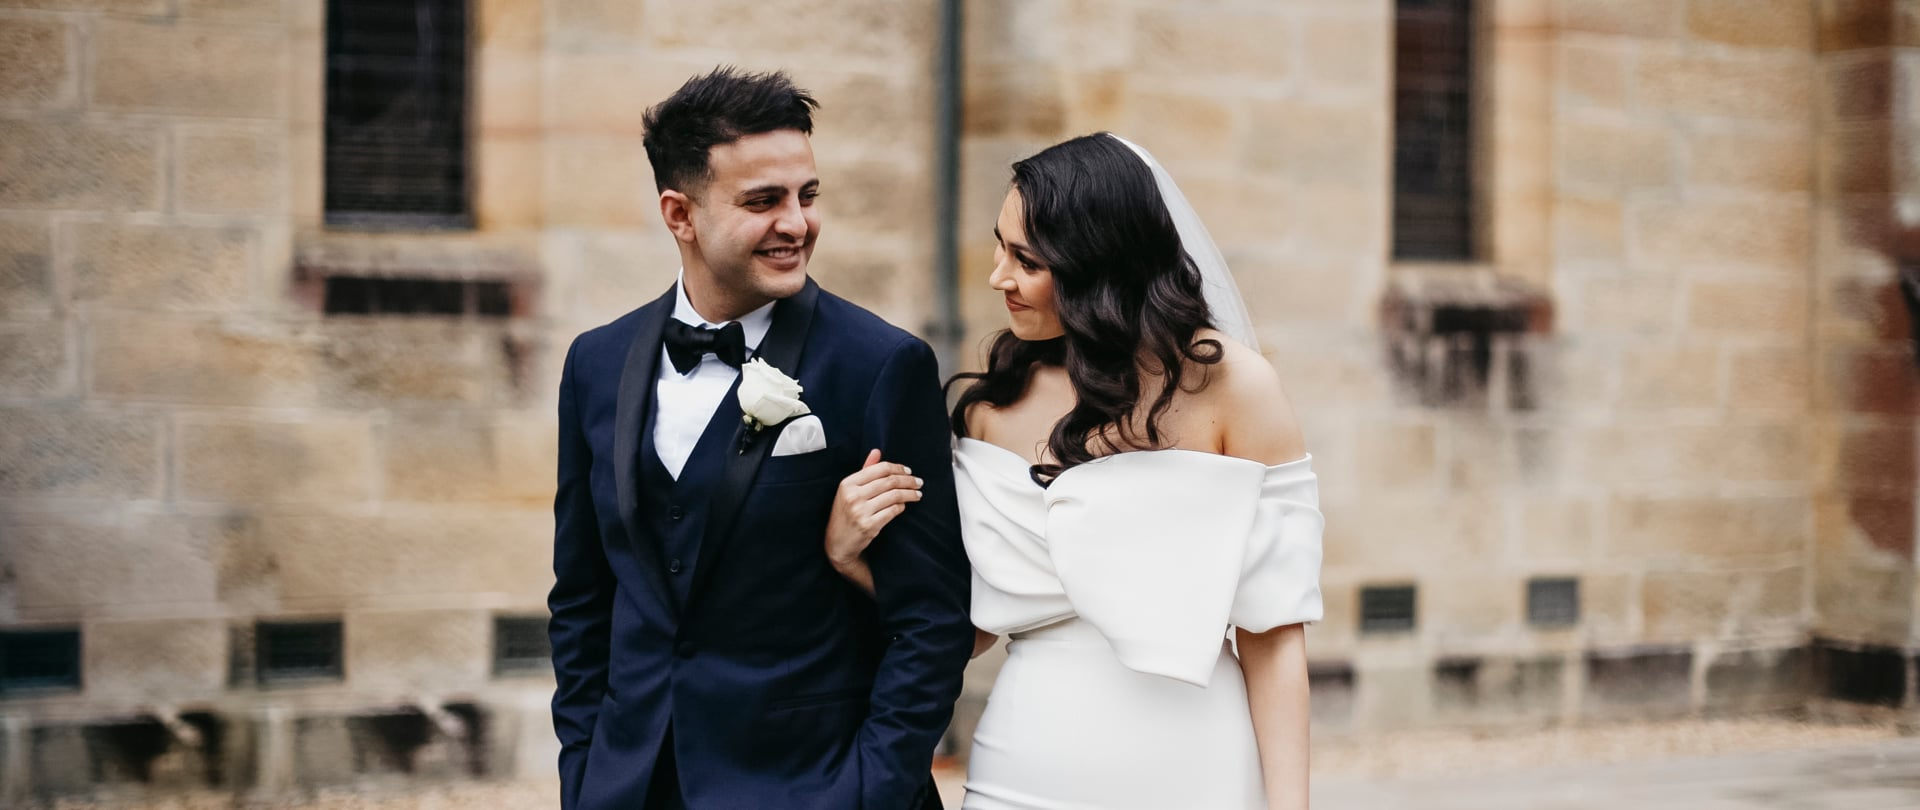 Chanelle & Seth Wedding Video Filmed at Sydney, New South Wales